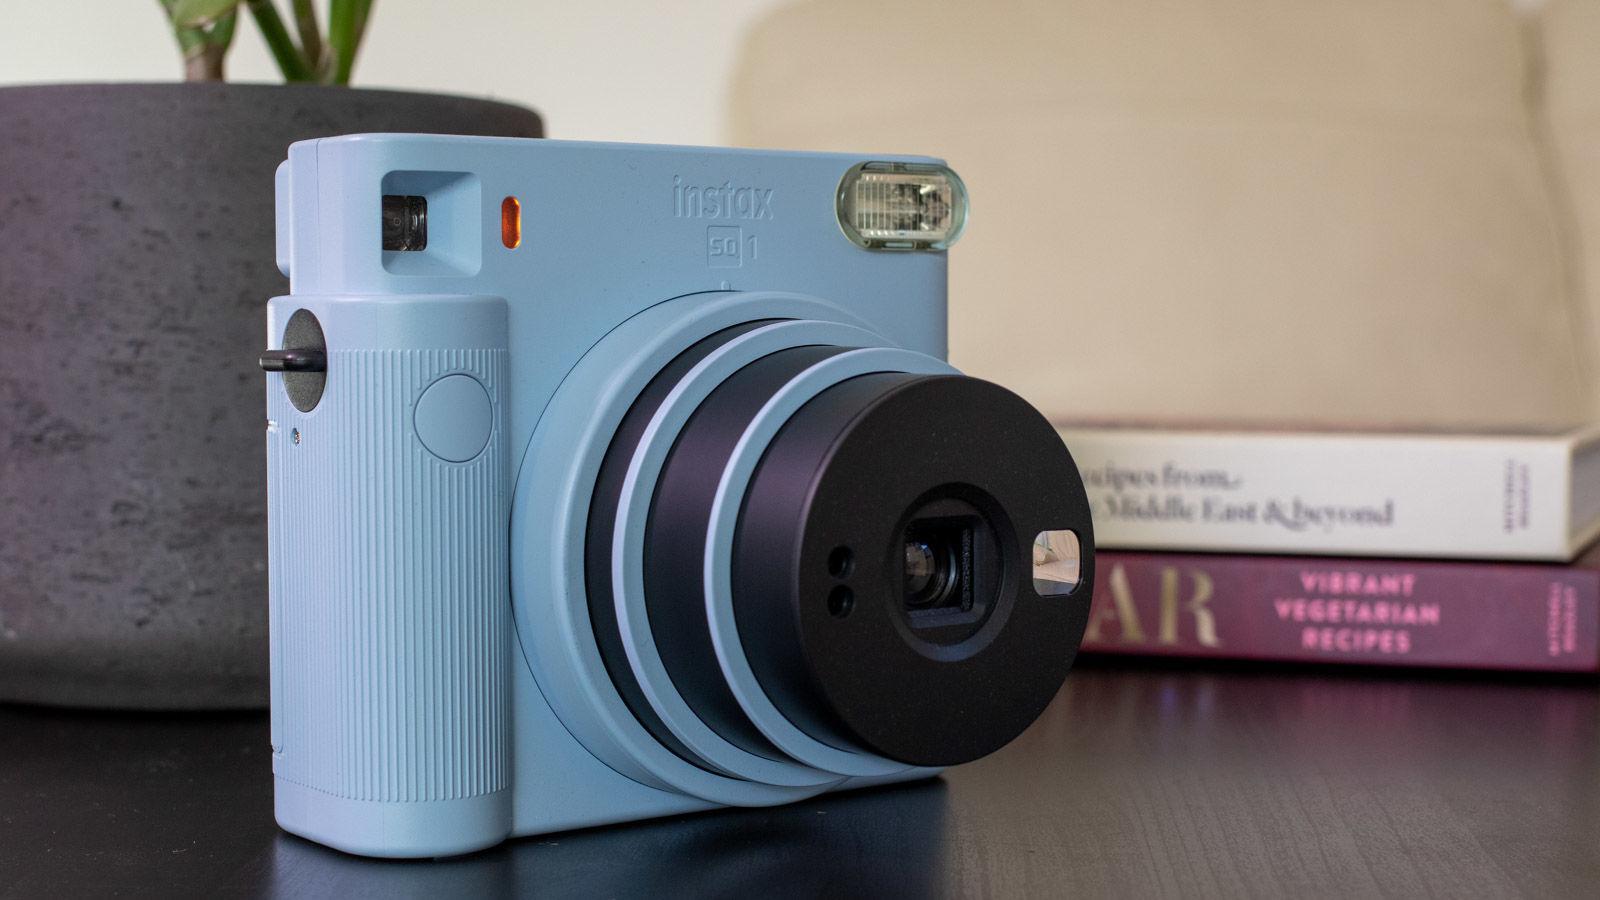 Instax Square SQ6 lens